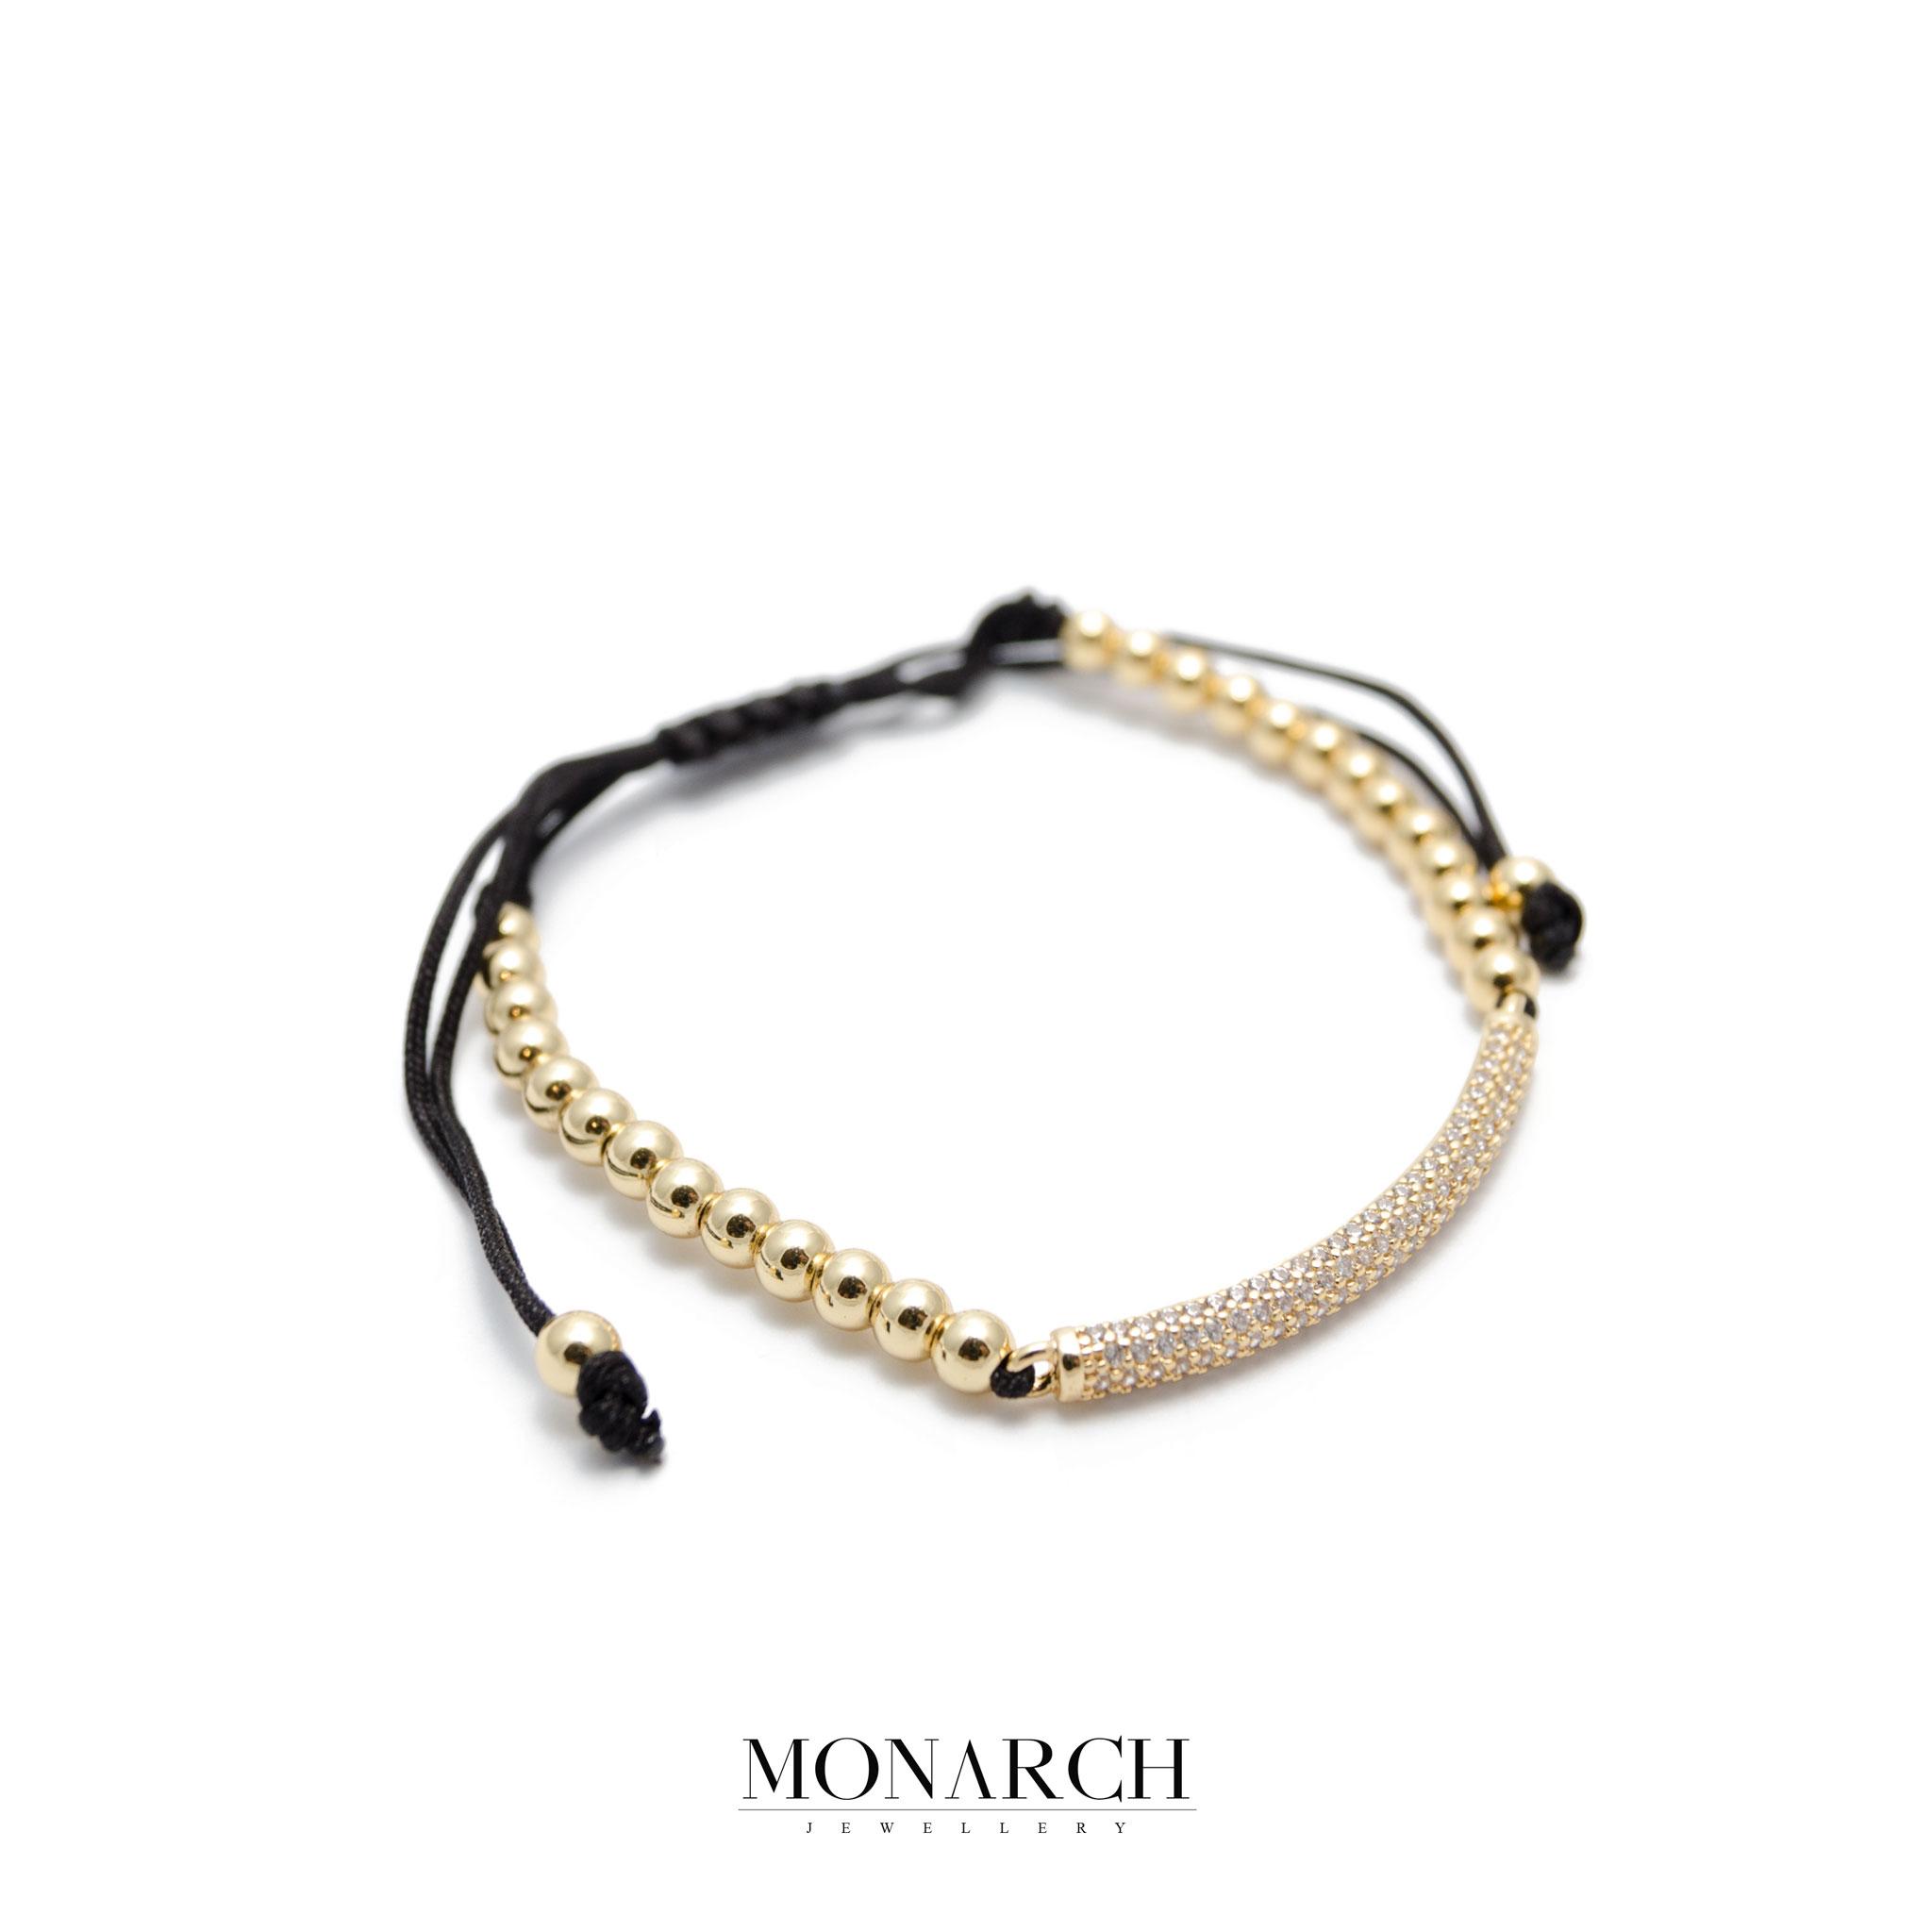 Monarch Jewellery 24K Micro Pave Charm Luxury Macrame Bracelet